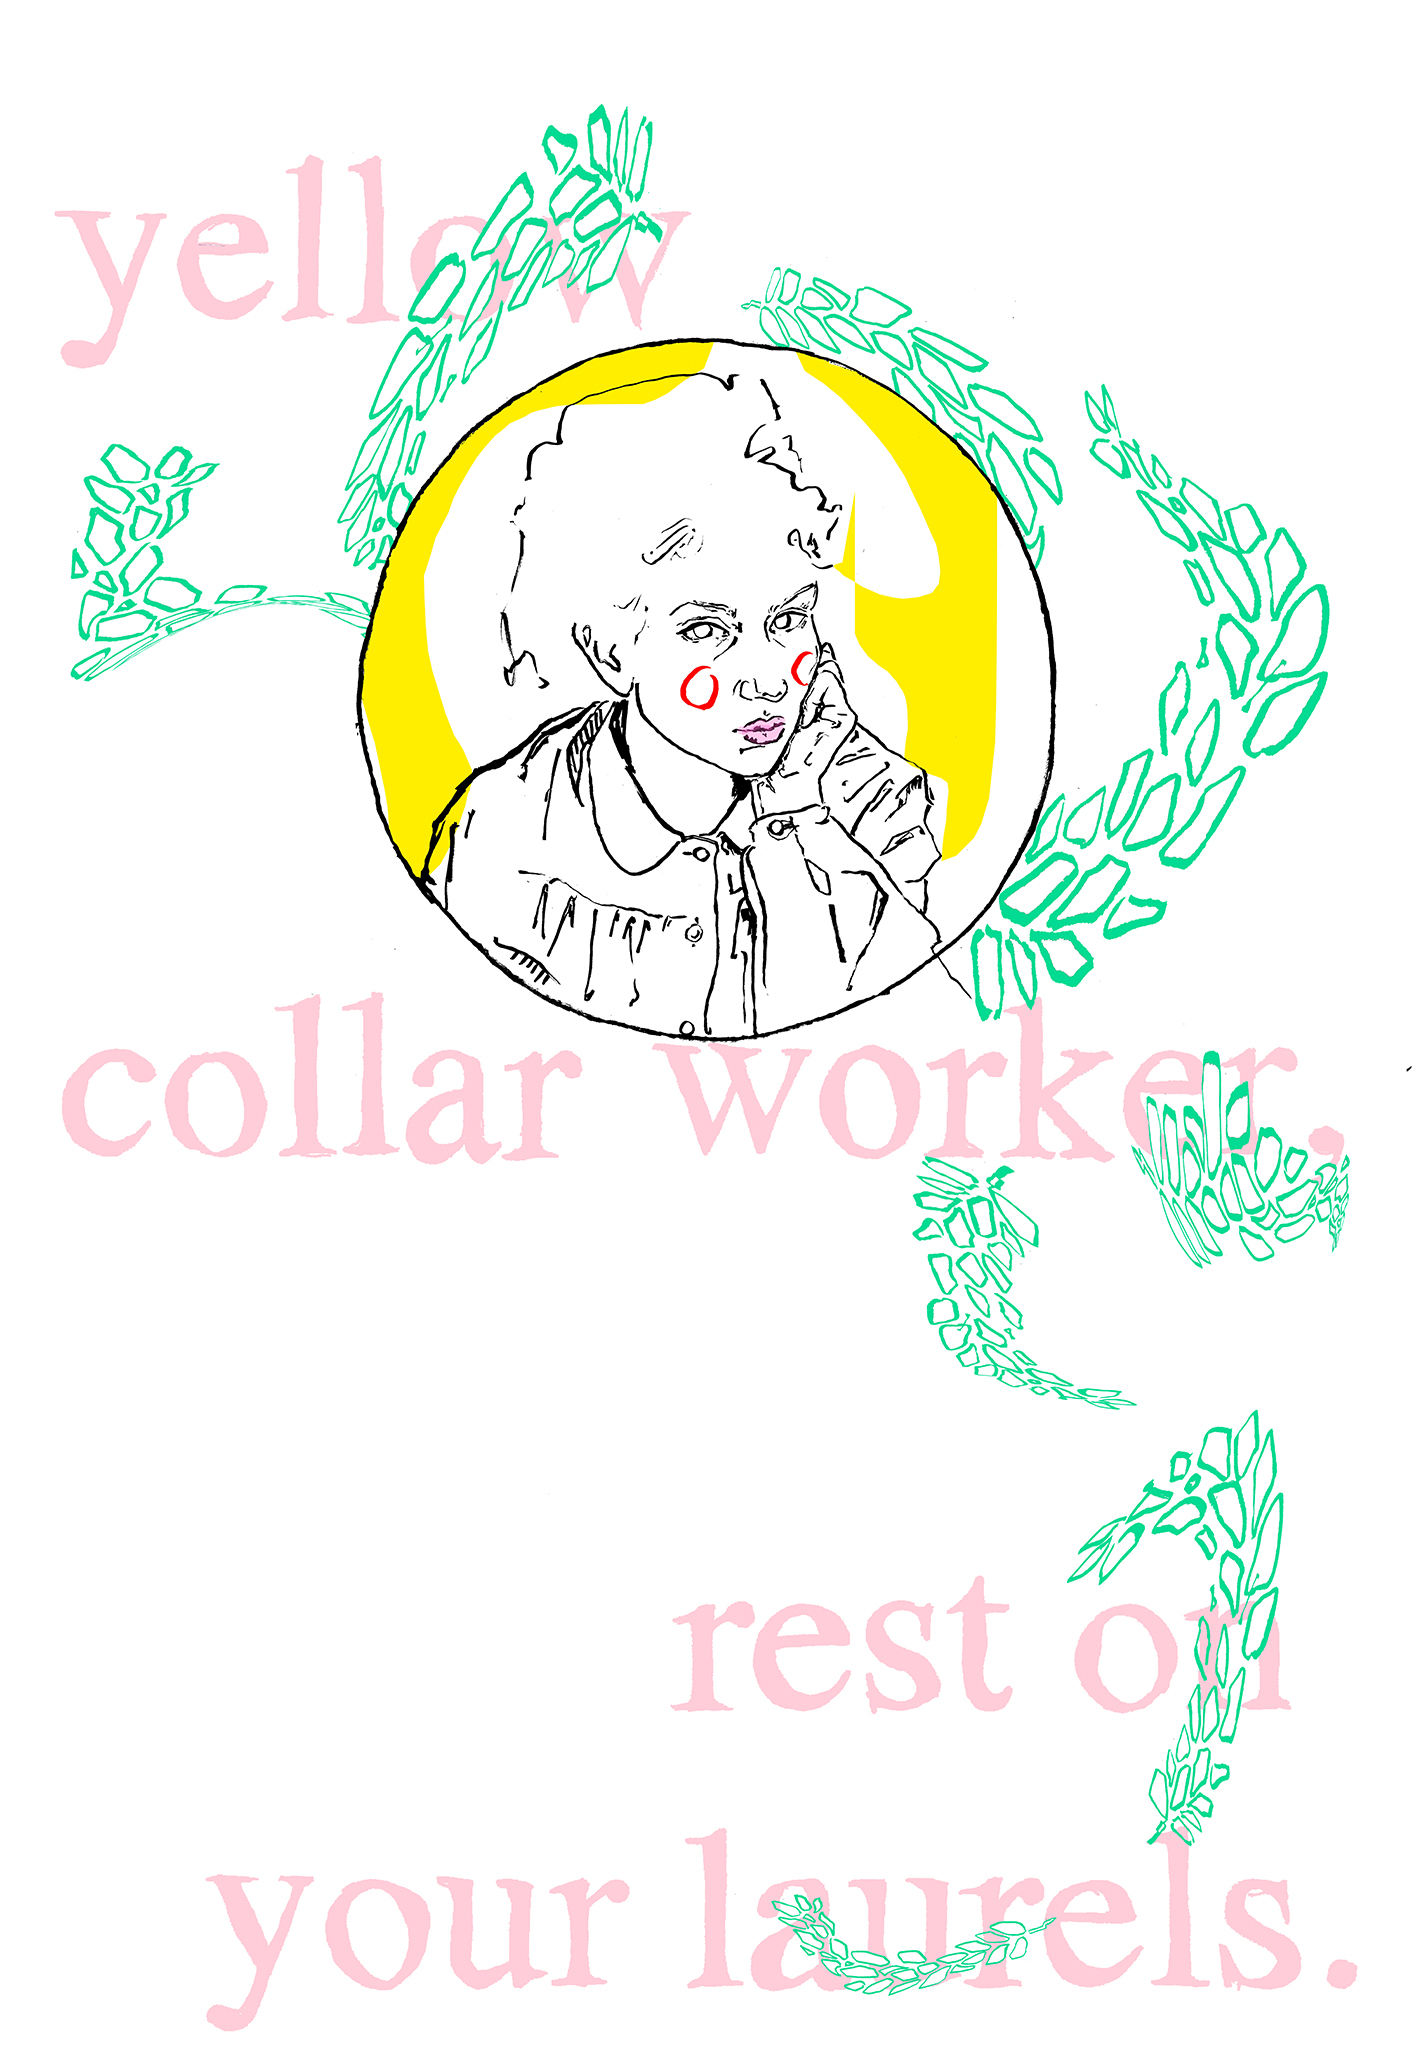 YellowCollarWorkerPrint.jpg